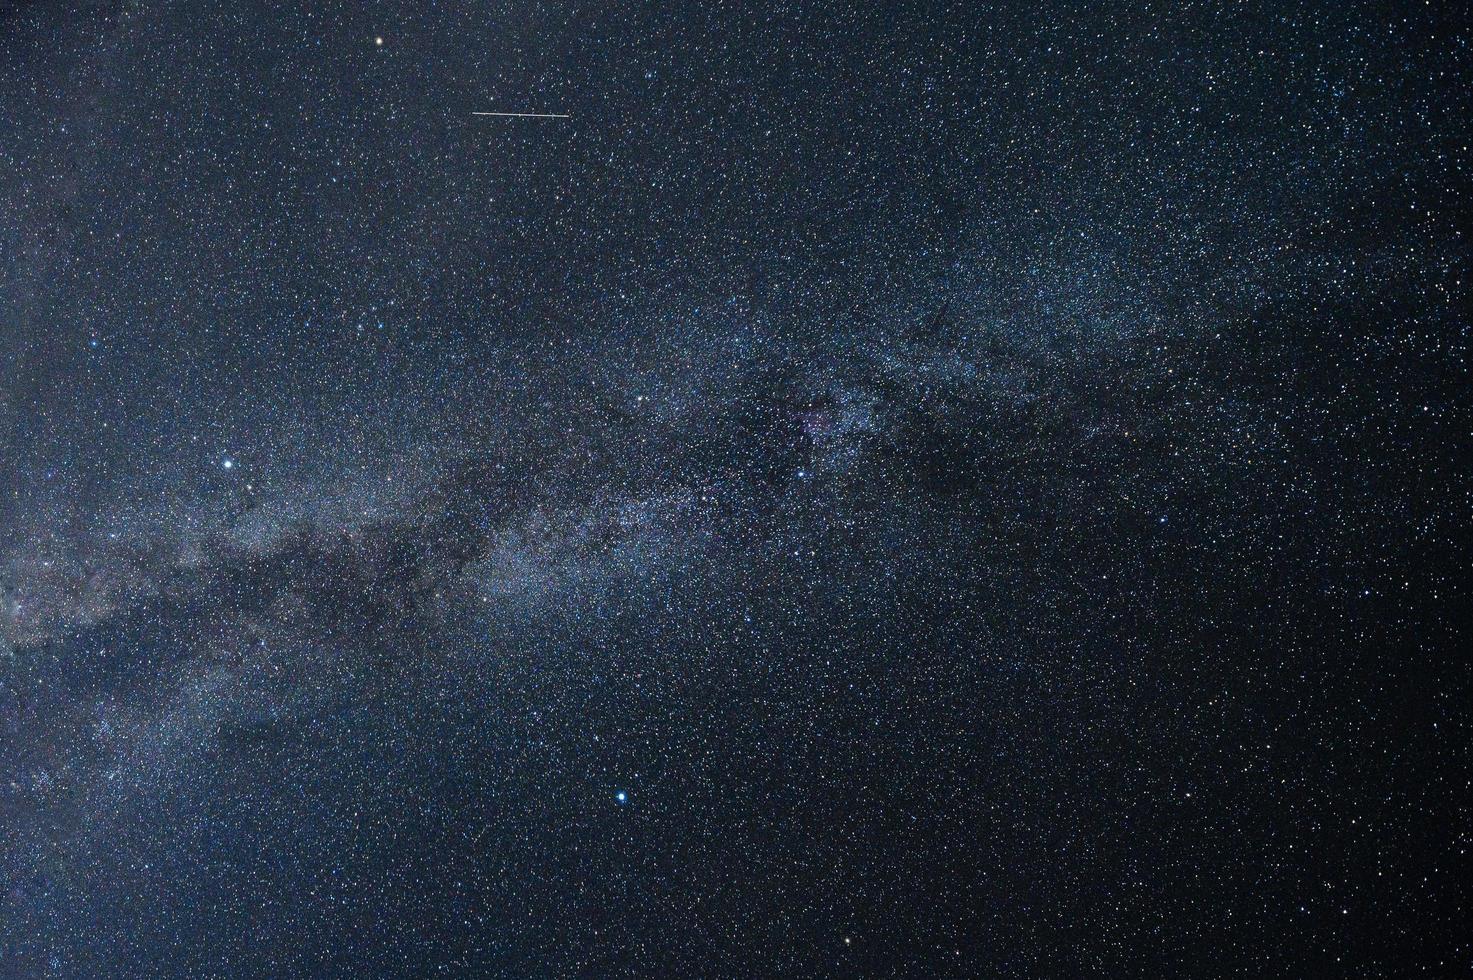 Night scene of the Milky Way photo